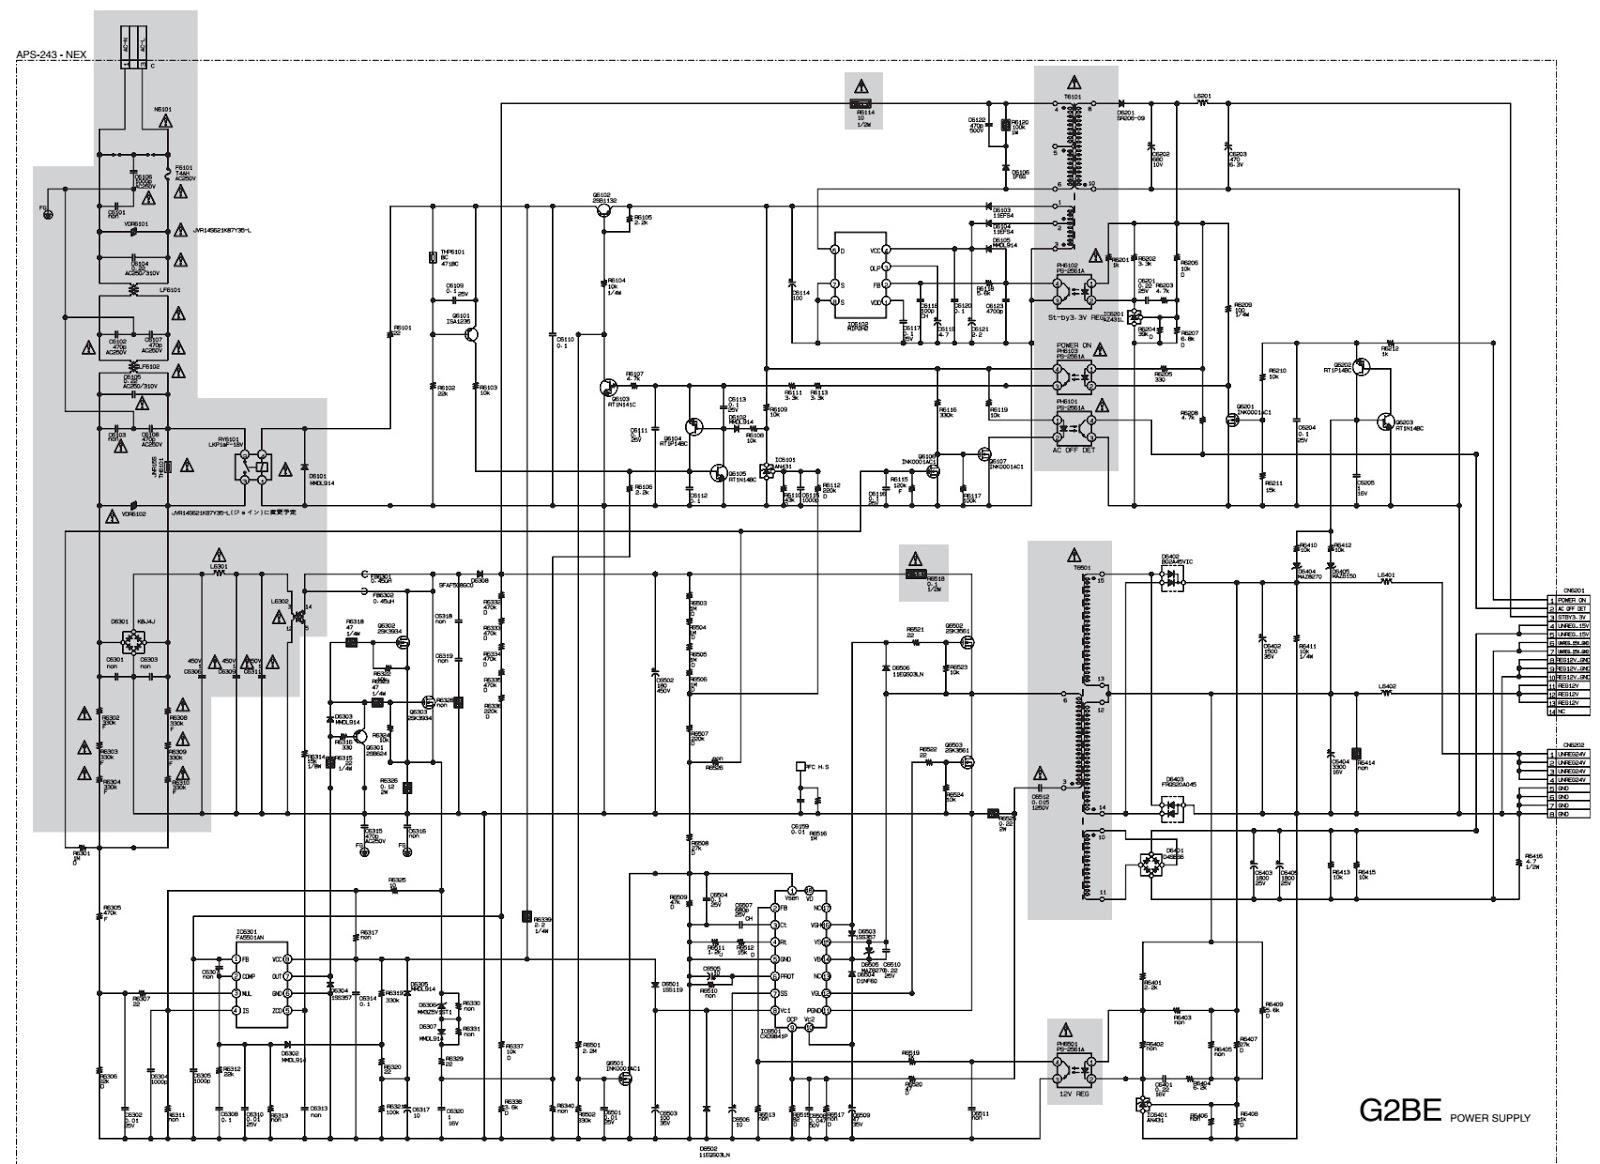 sony kdl 32l5000 power supply schematic